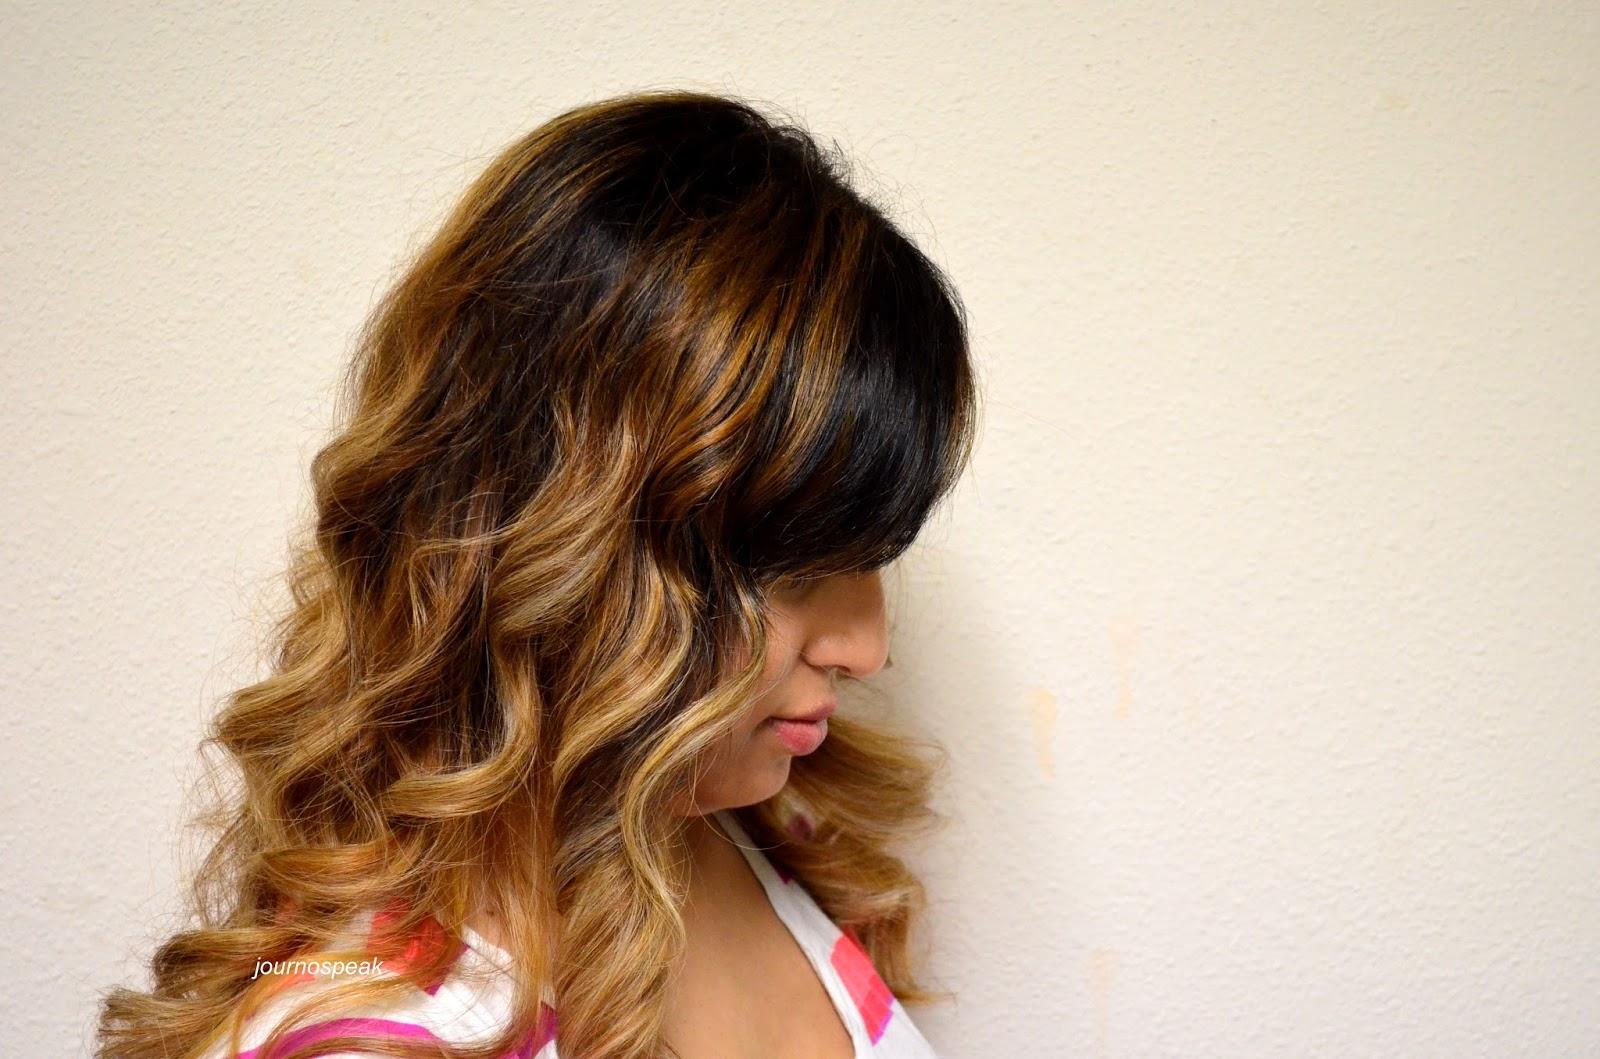 Golden Honey Balayage New Hair Color Journospeak